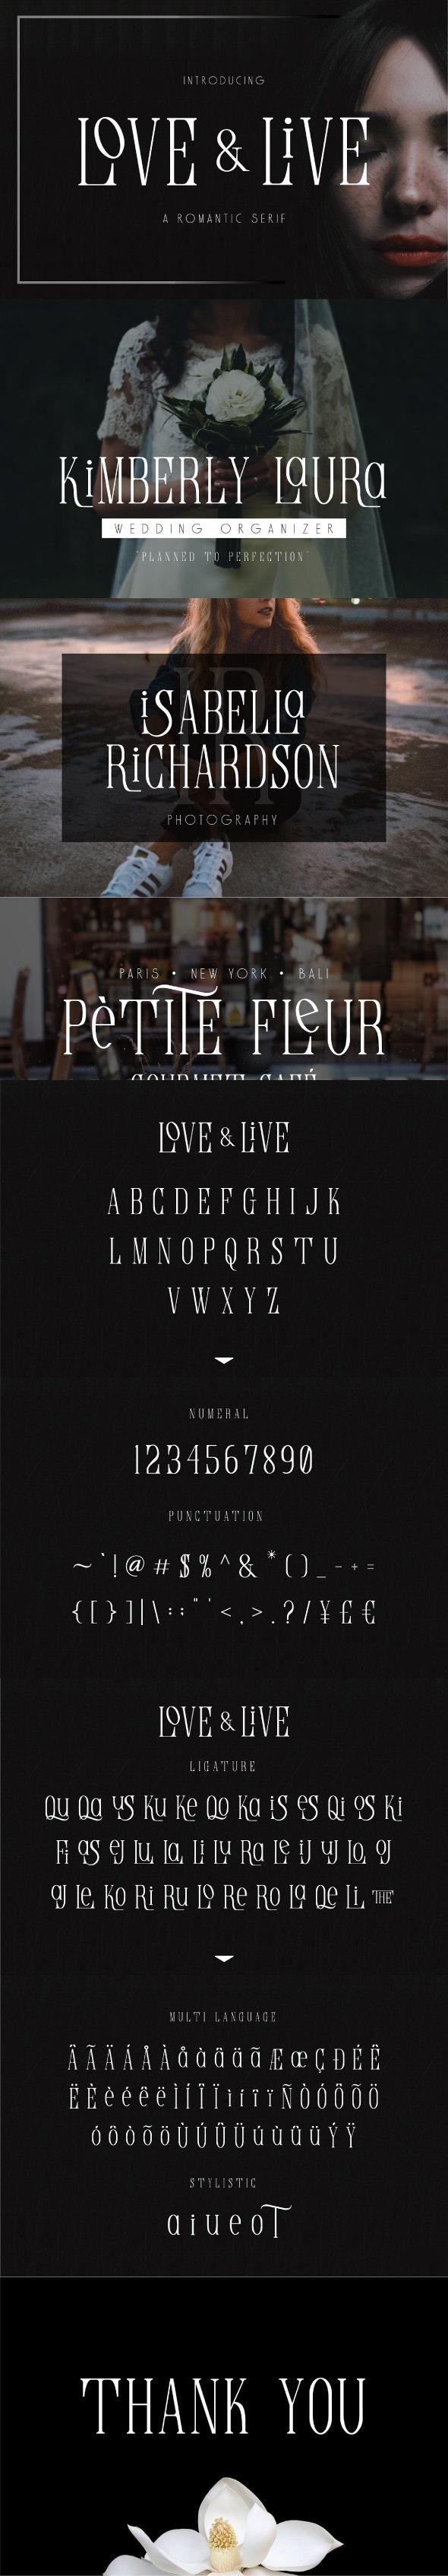 Love & Life Romantic Serif Font - Serif Fonts